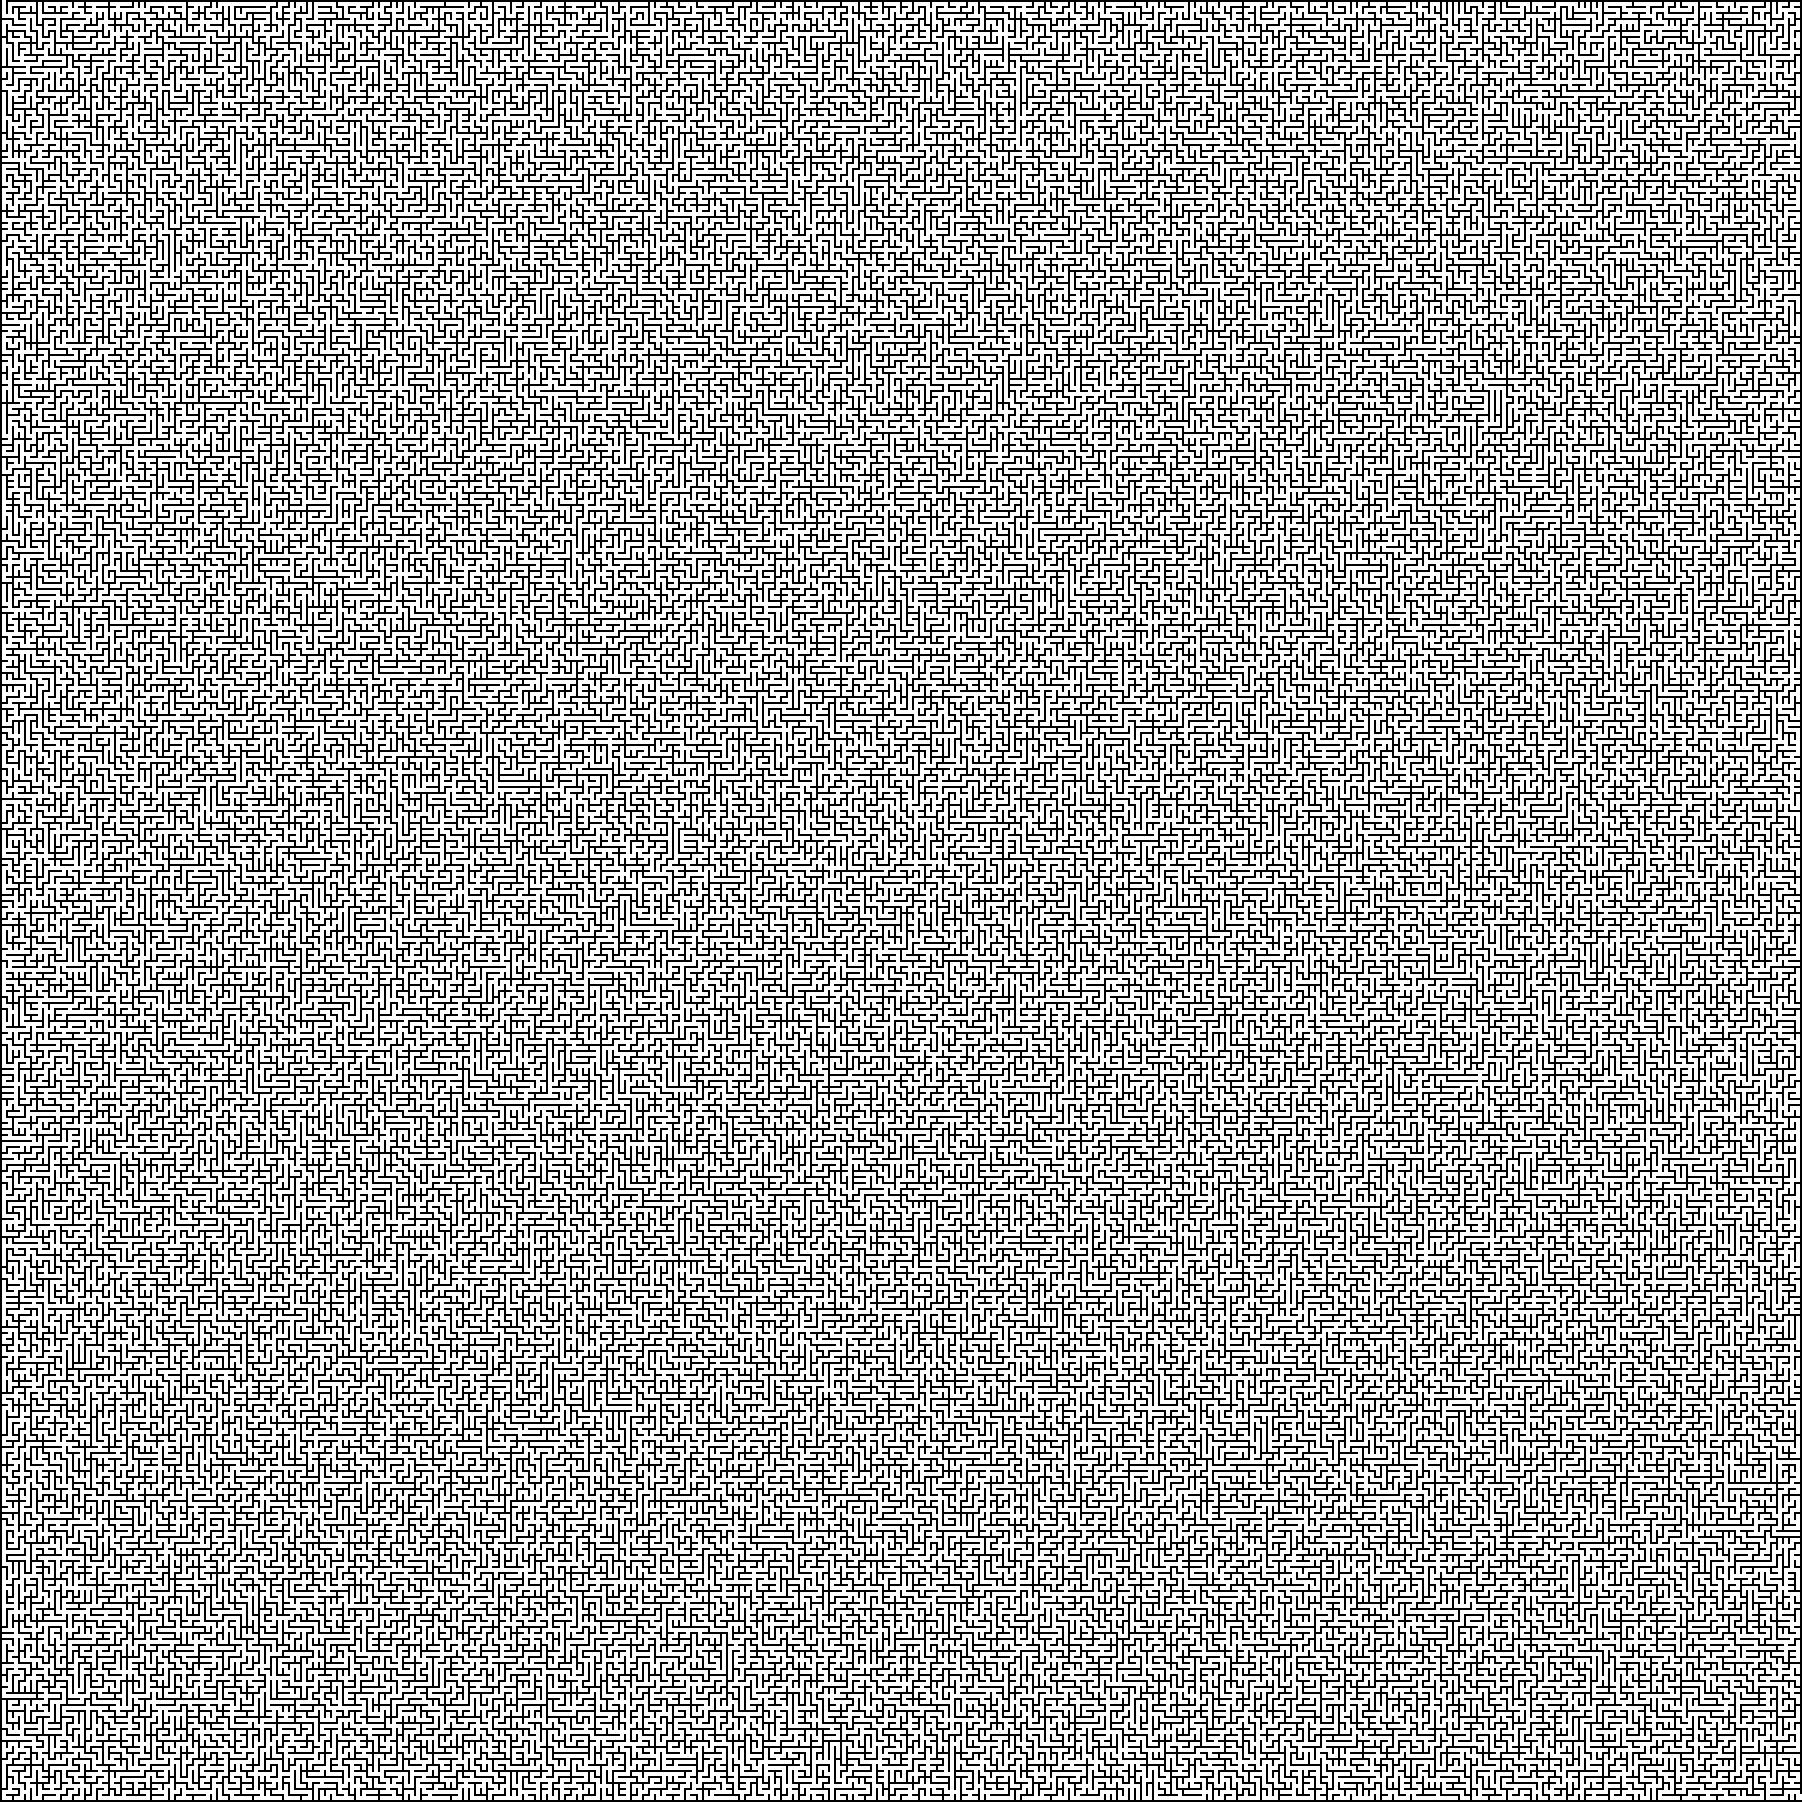 Алгоритм поиска путей в лабиринте